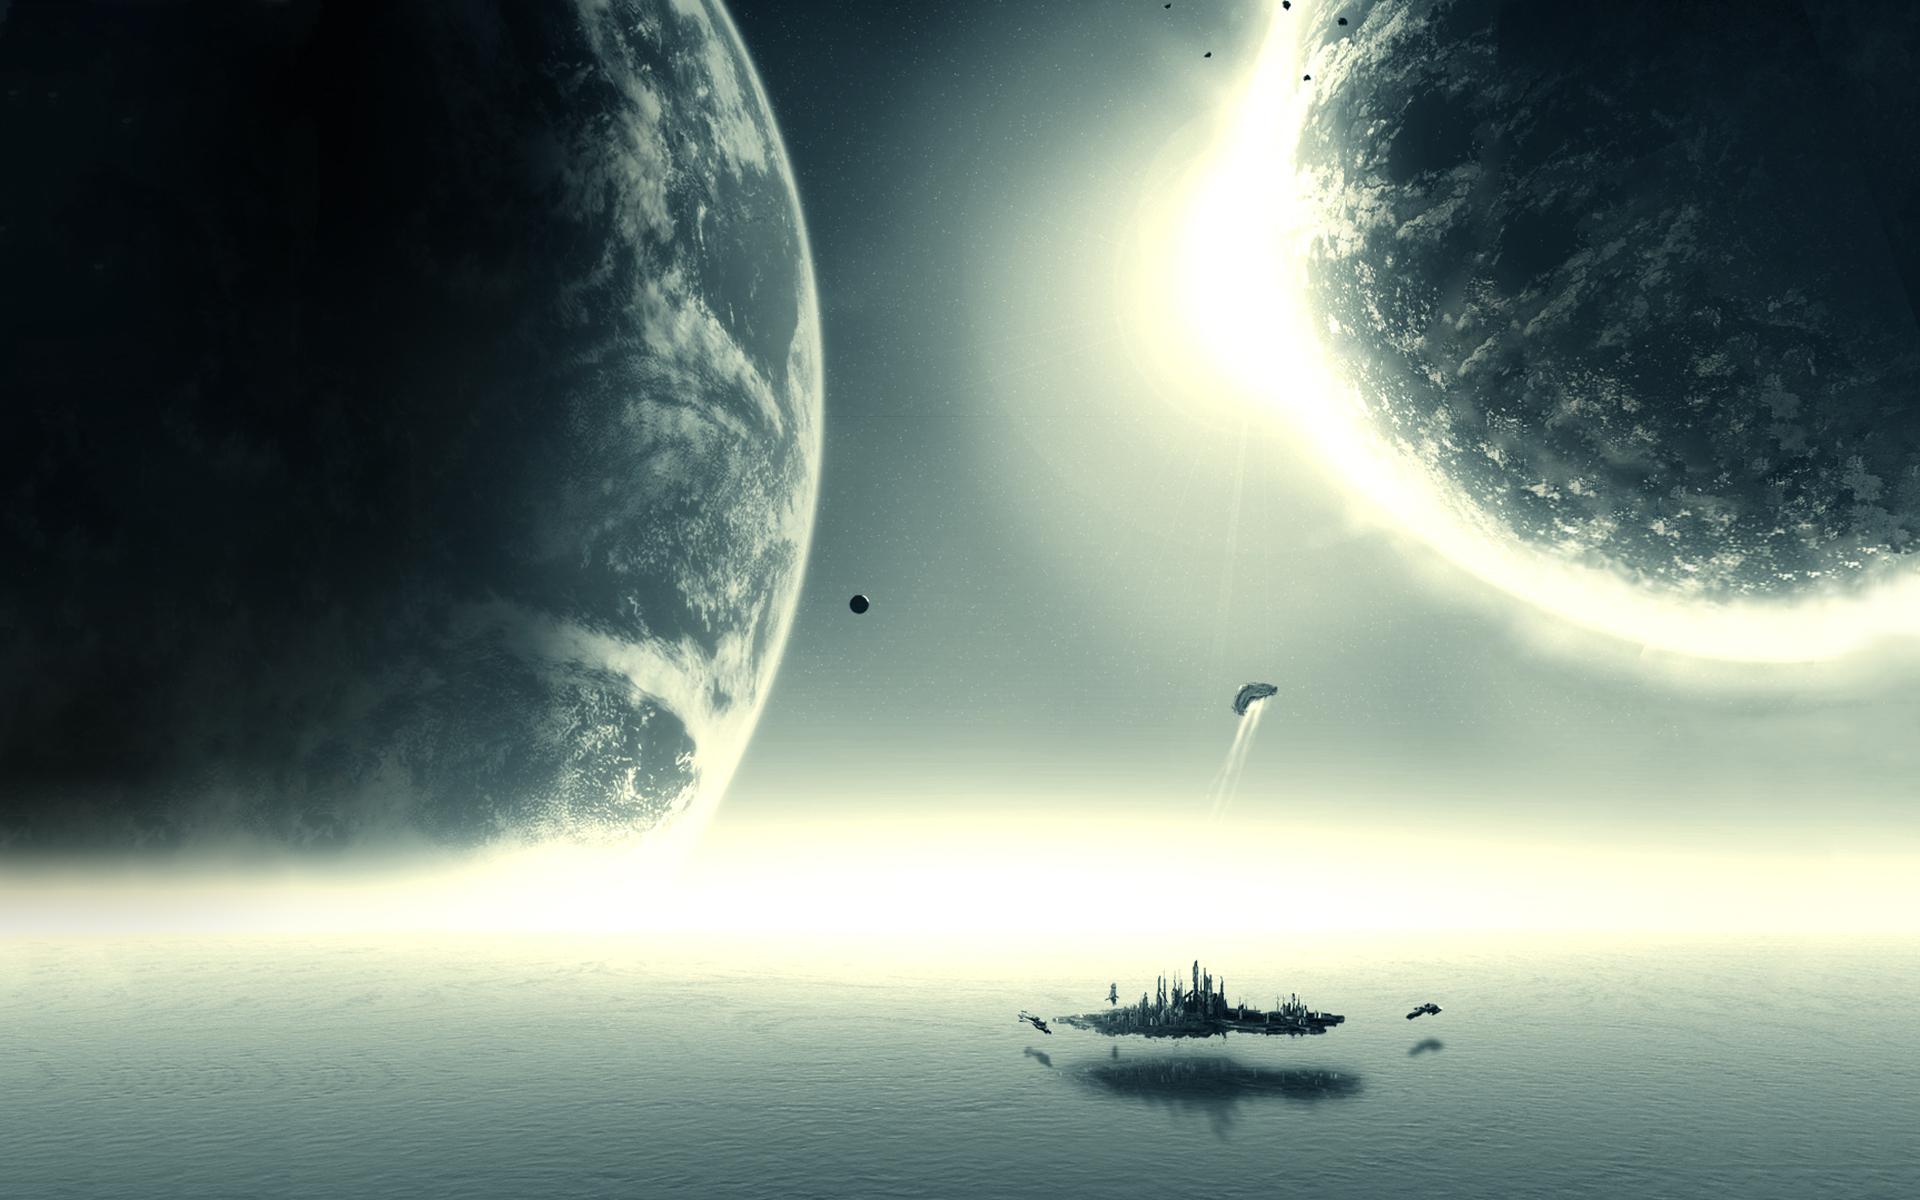 Alien Water World Planets HD Wallpapers 1920x1200